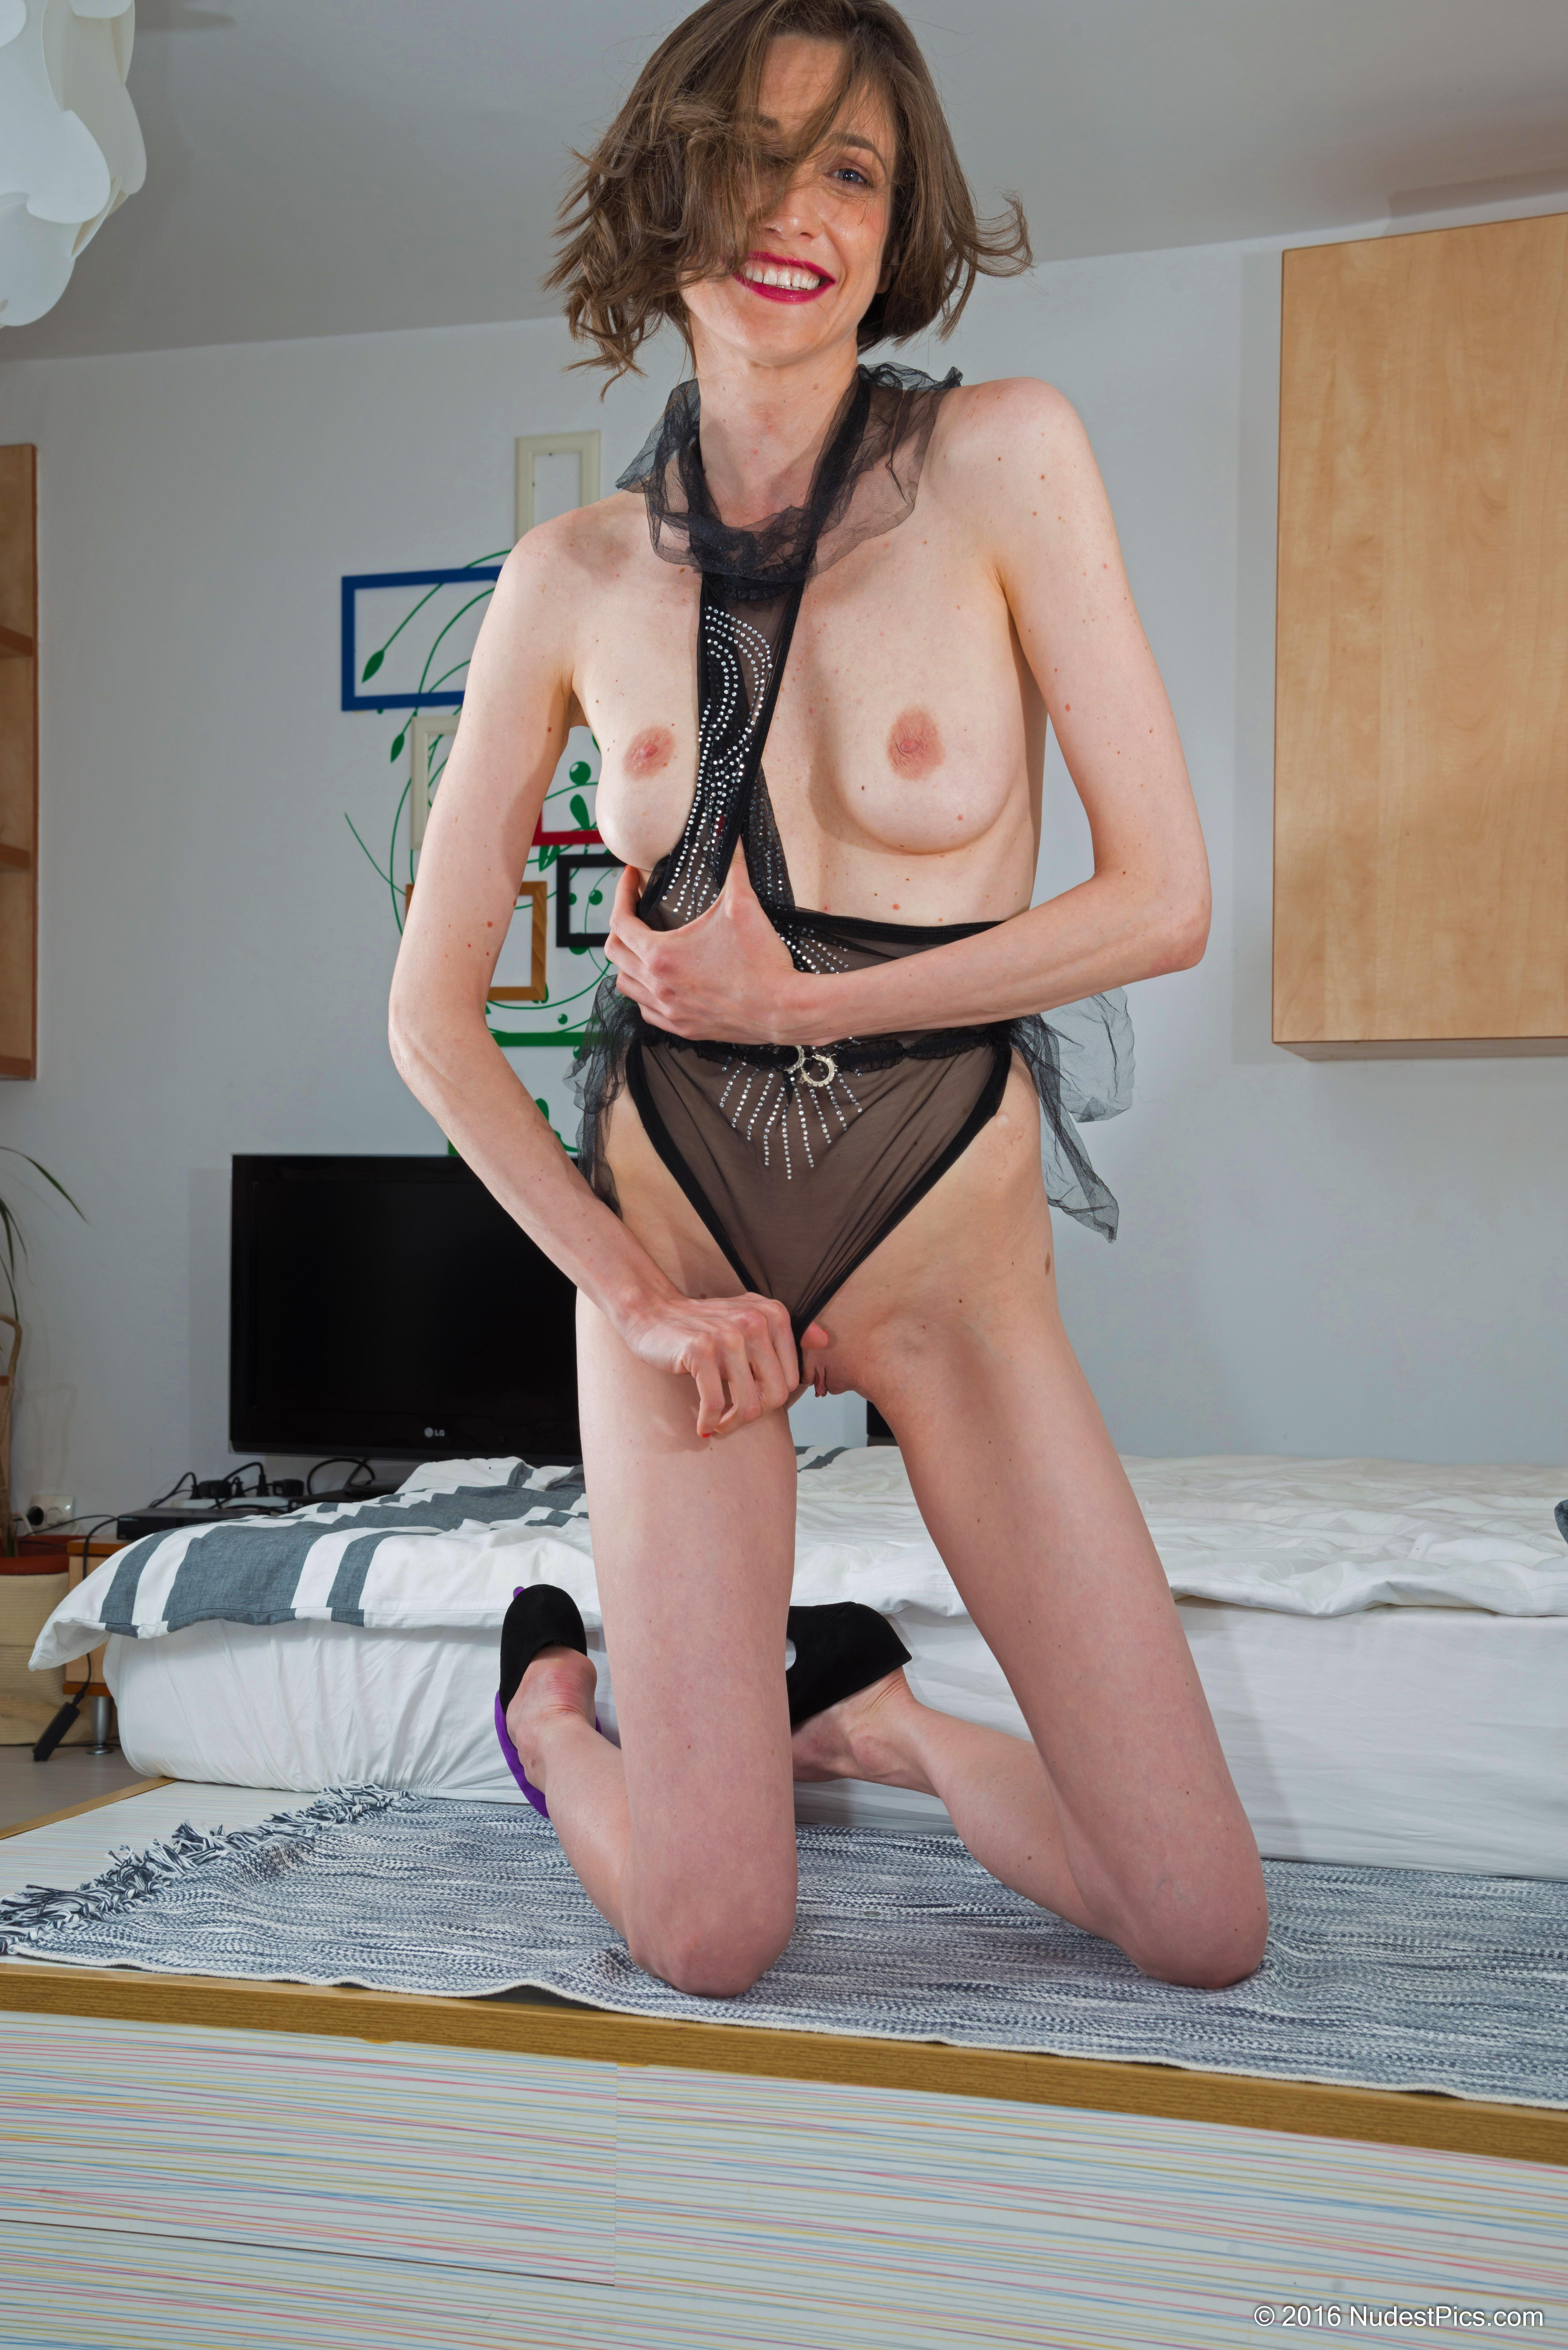 Skinny Ex Model Woman Flashing Pussy & Breasts HD